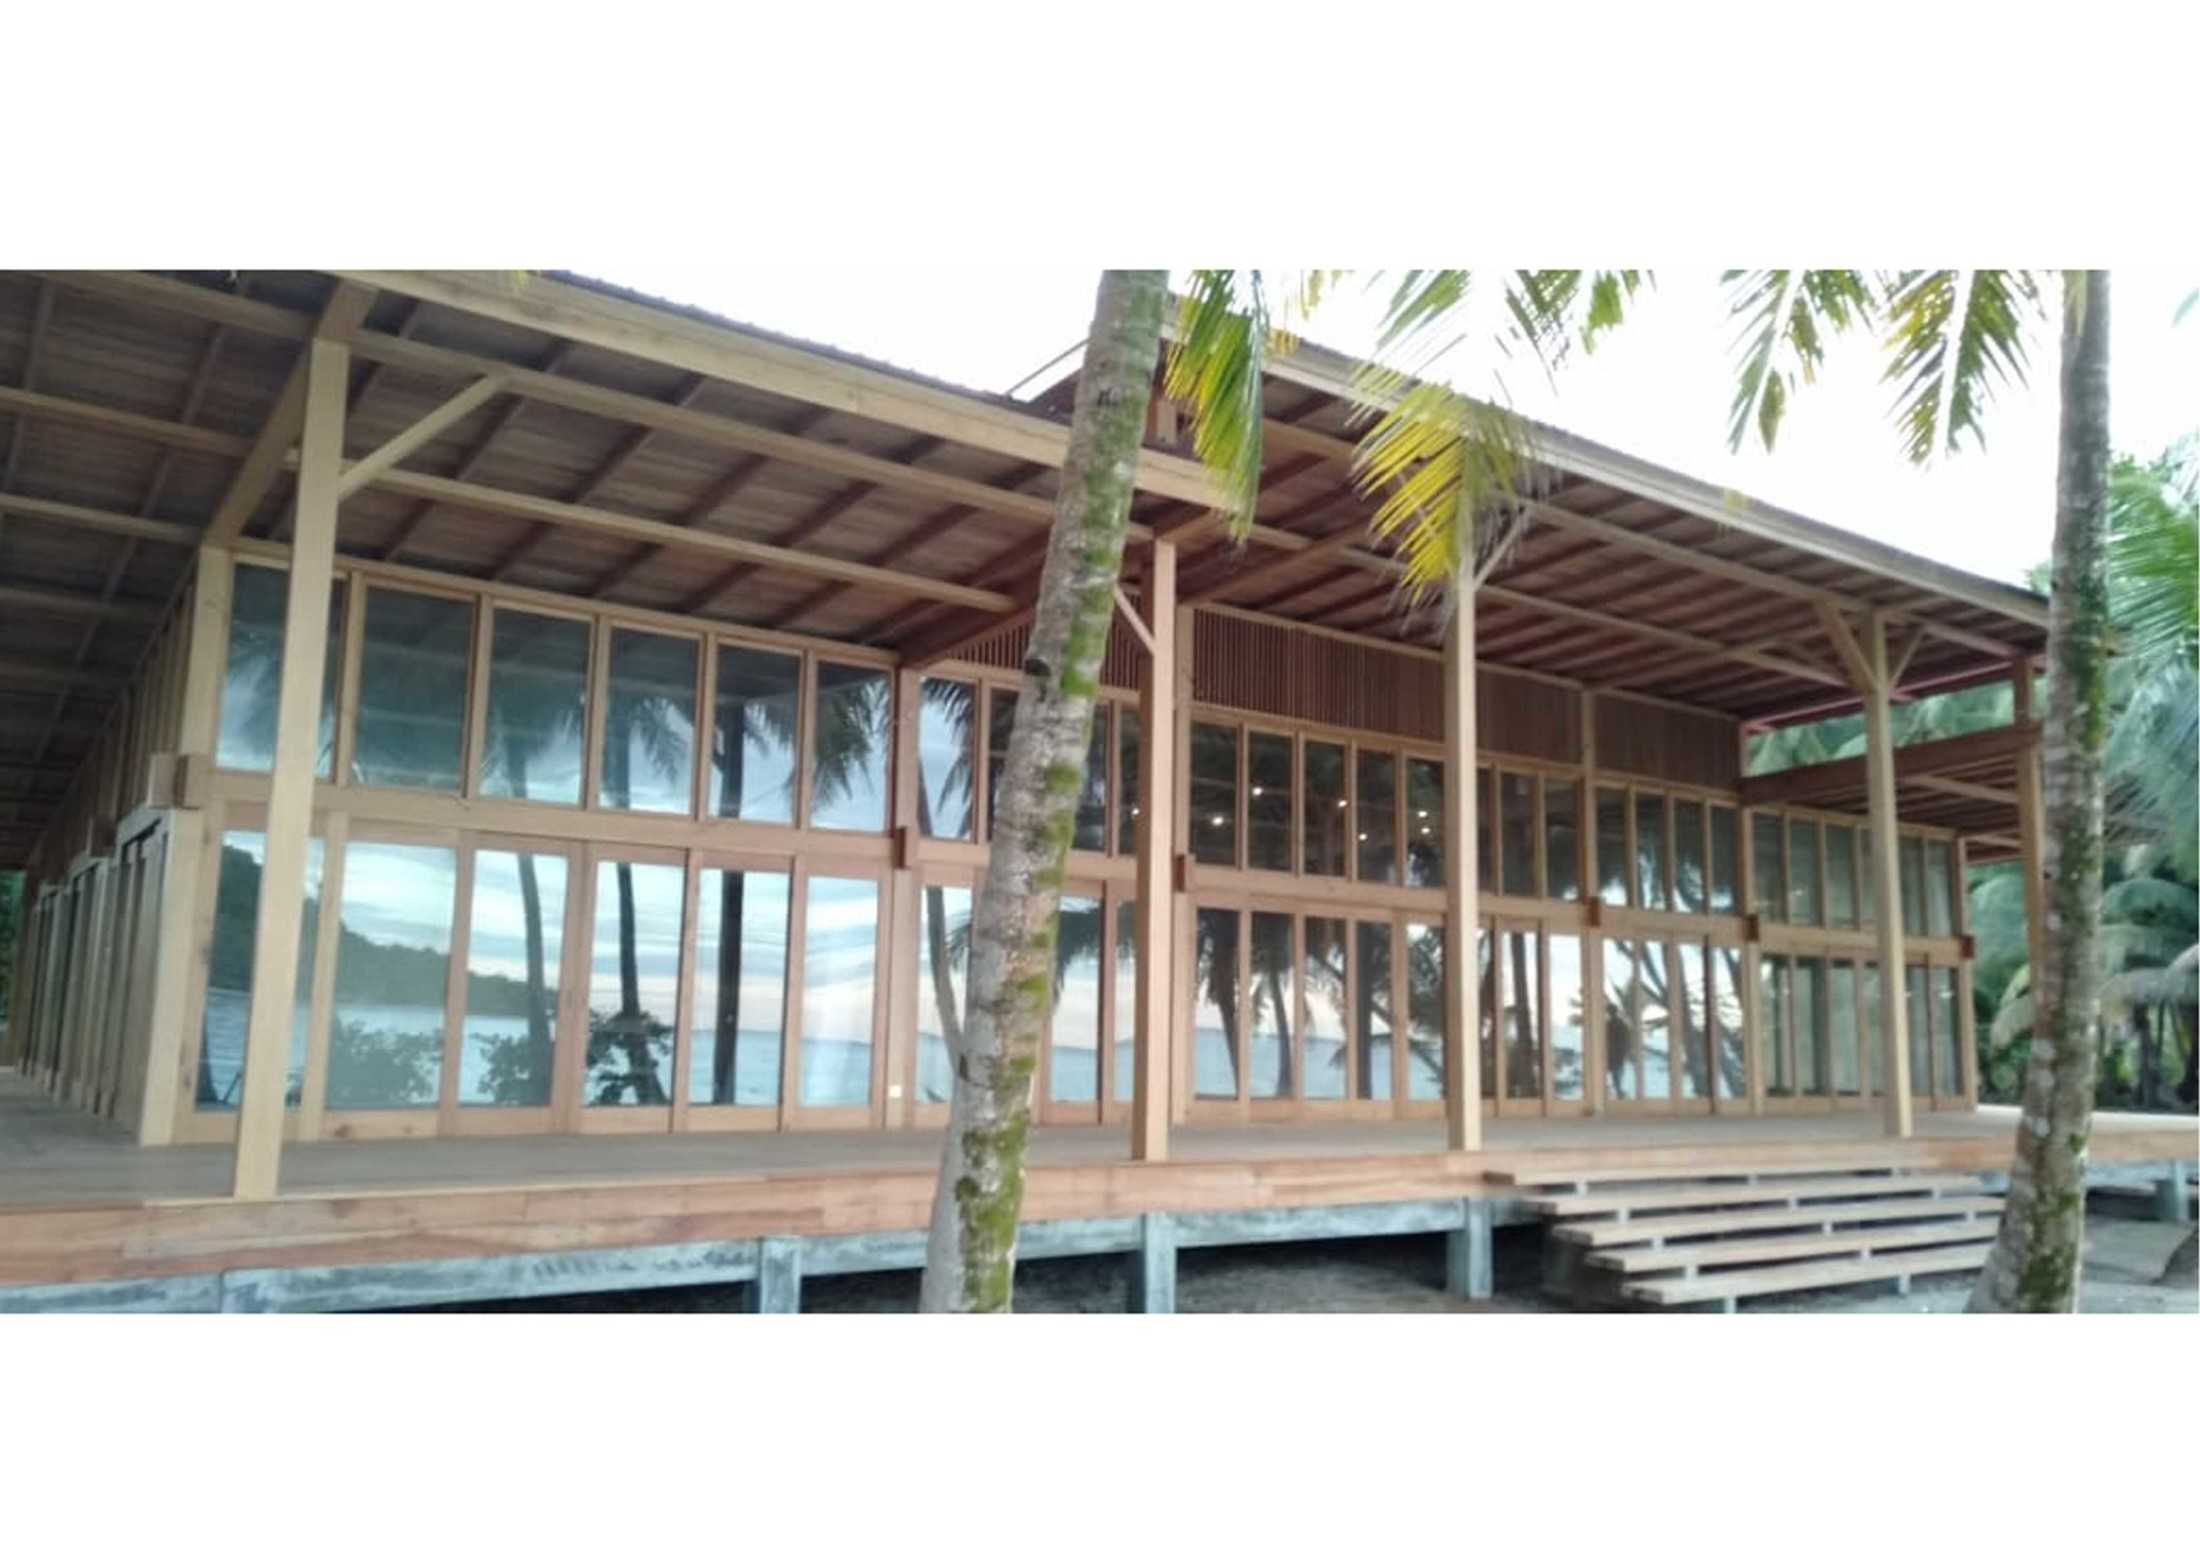 Revan Teggar Mentawai Beach House Kabupaten Kepulauan Mentawai, Sumatera Barat, Indonesia Kabupaten Kepulauan Mentawai, Sumatera Barat, Indonesia Revan-Teggar-Mentawai-Beach-House  107035